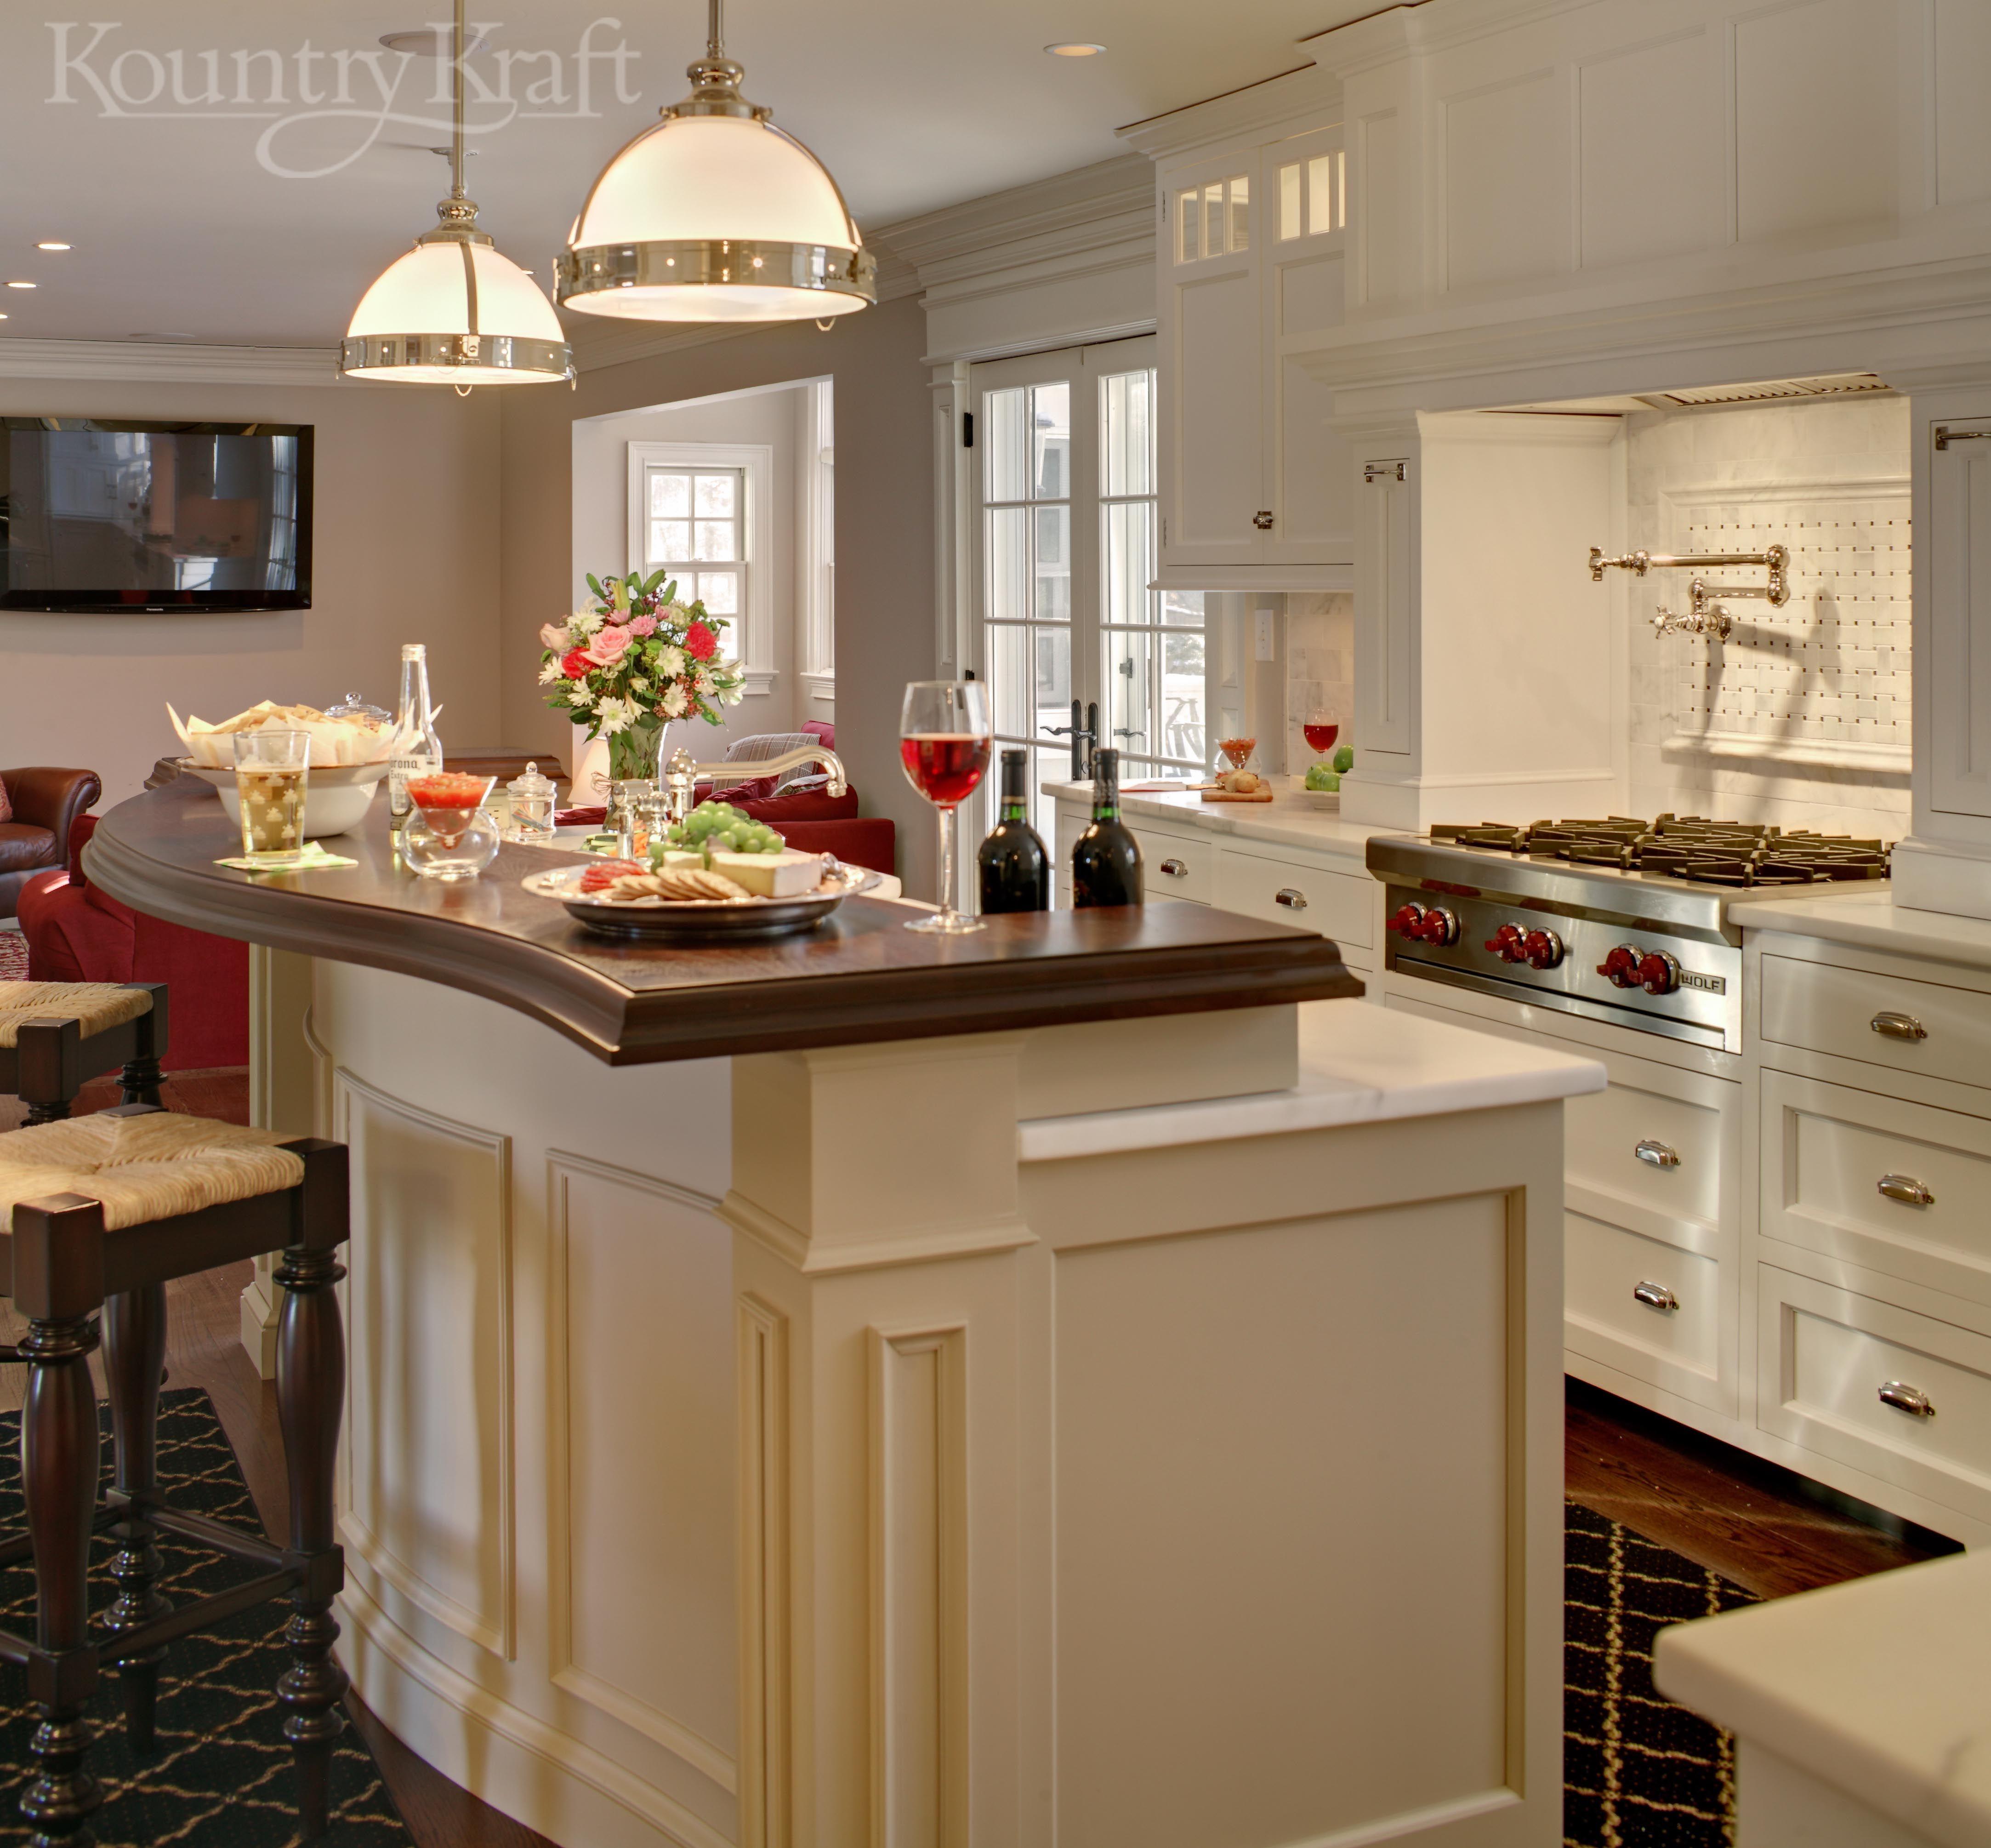 Pin By Kountry Kraft Inc On Custom Kitchen Cabinets Custom